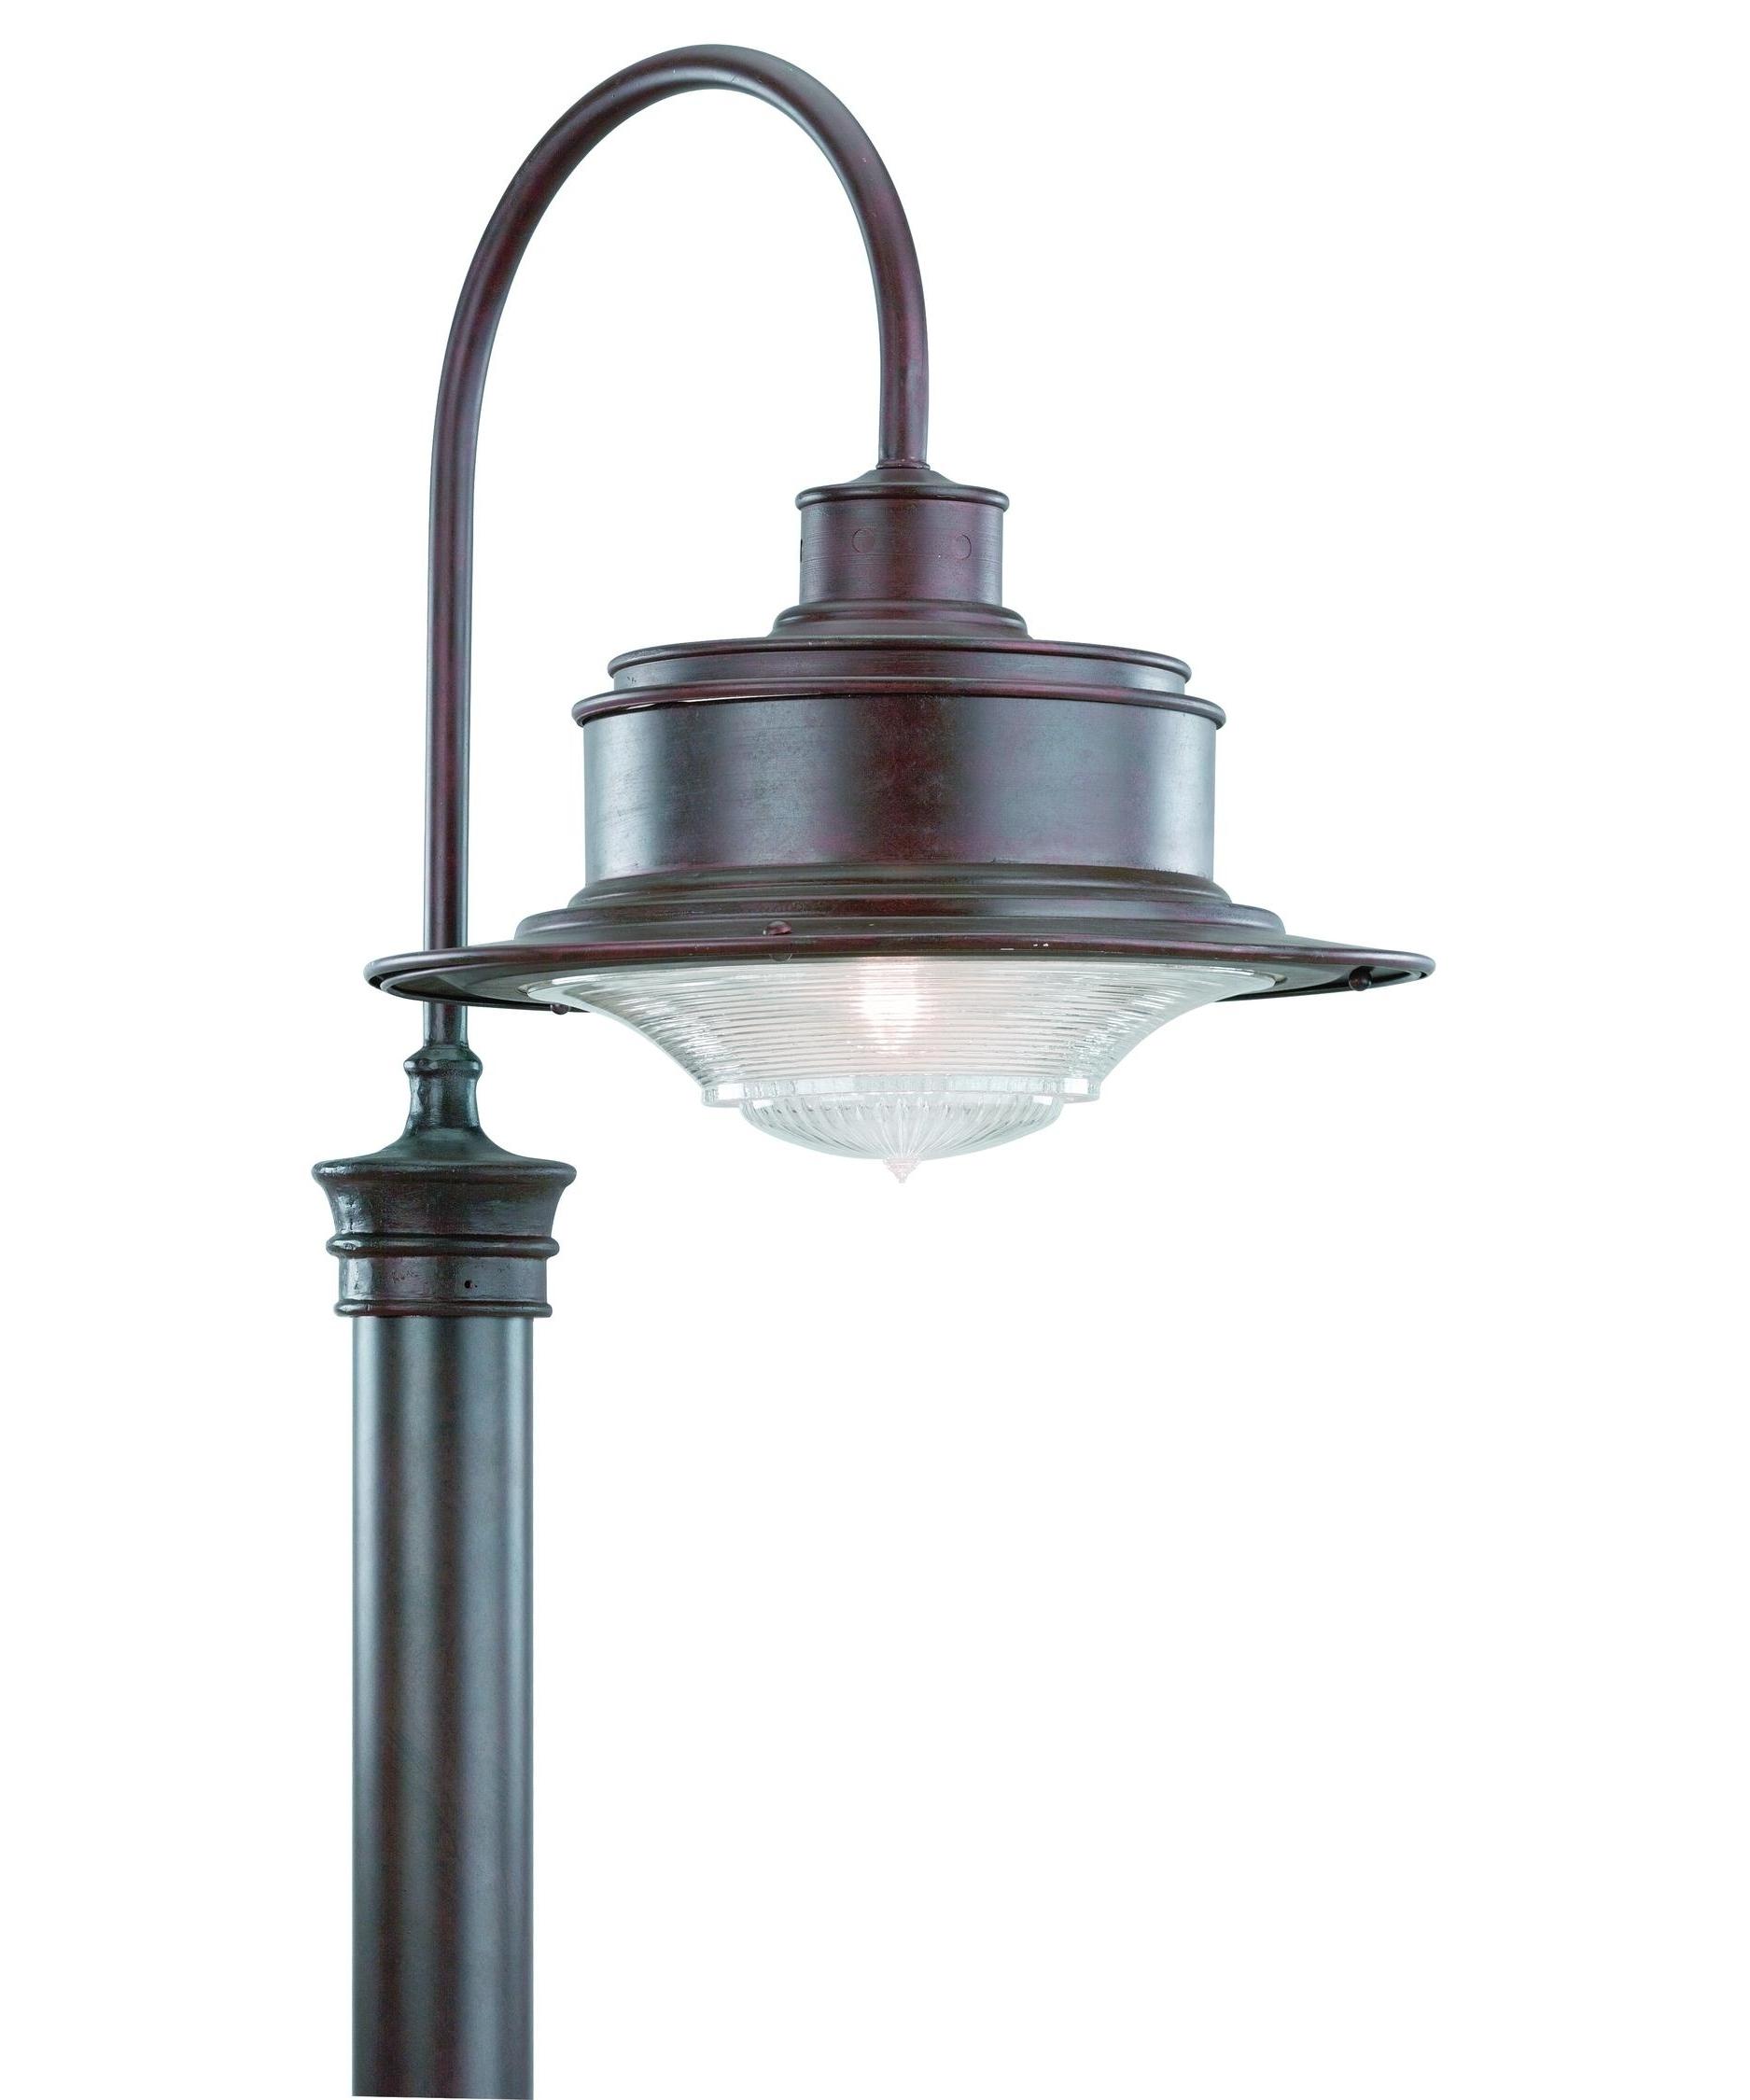 Mid Century Modern Outdoor Post Lighting • Outdoor Lighting For Well Known Modern Outdoor Post Lighting (View 6 of 20)